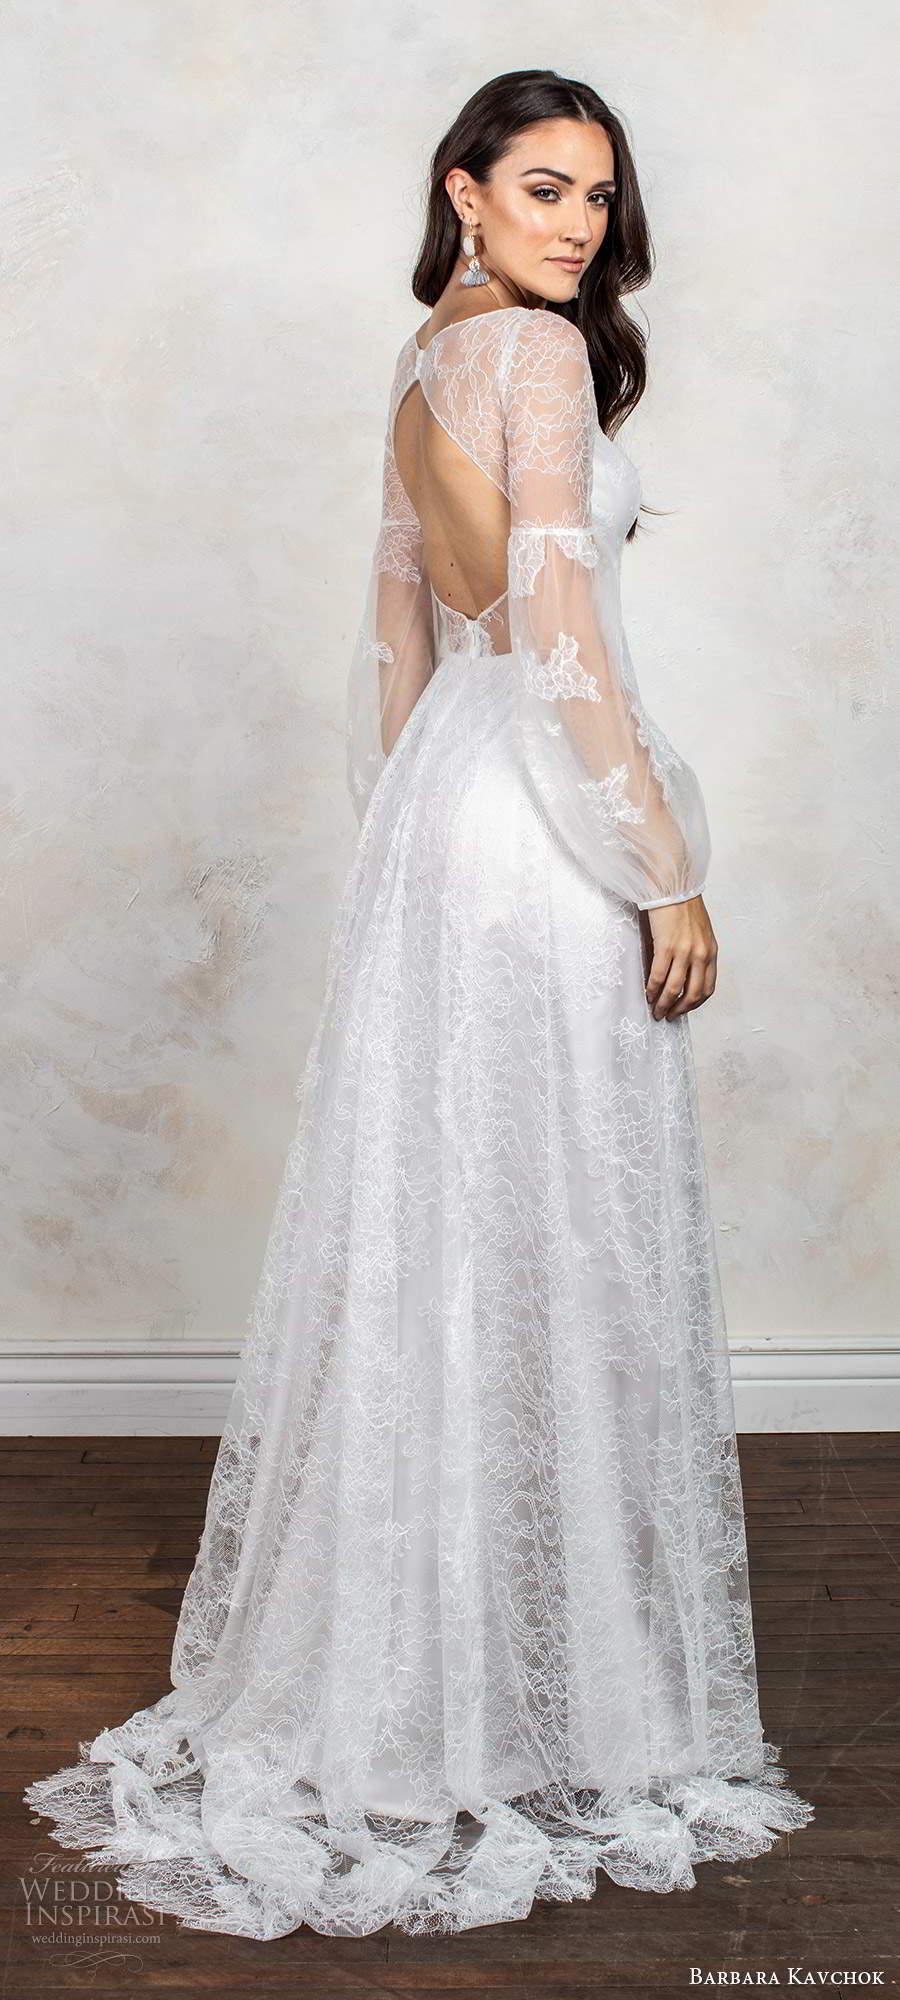 barbara kavchok fall 2020 bridal illusion long poet sleeves v neckline embellished lace bodice a line ball gown wedding dress keyhole back chapel train (10) bv